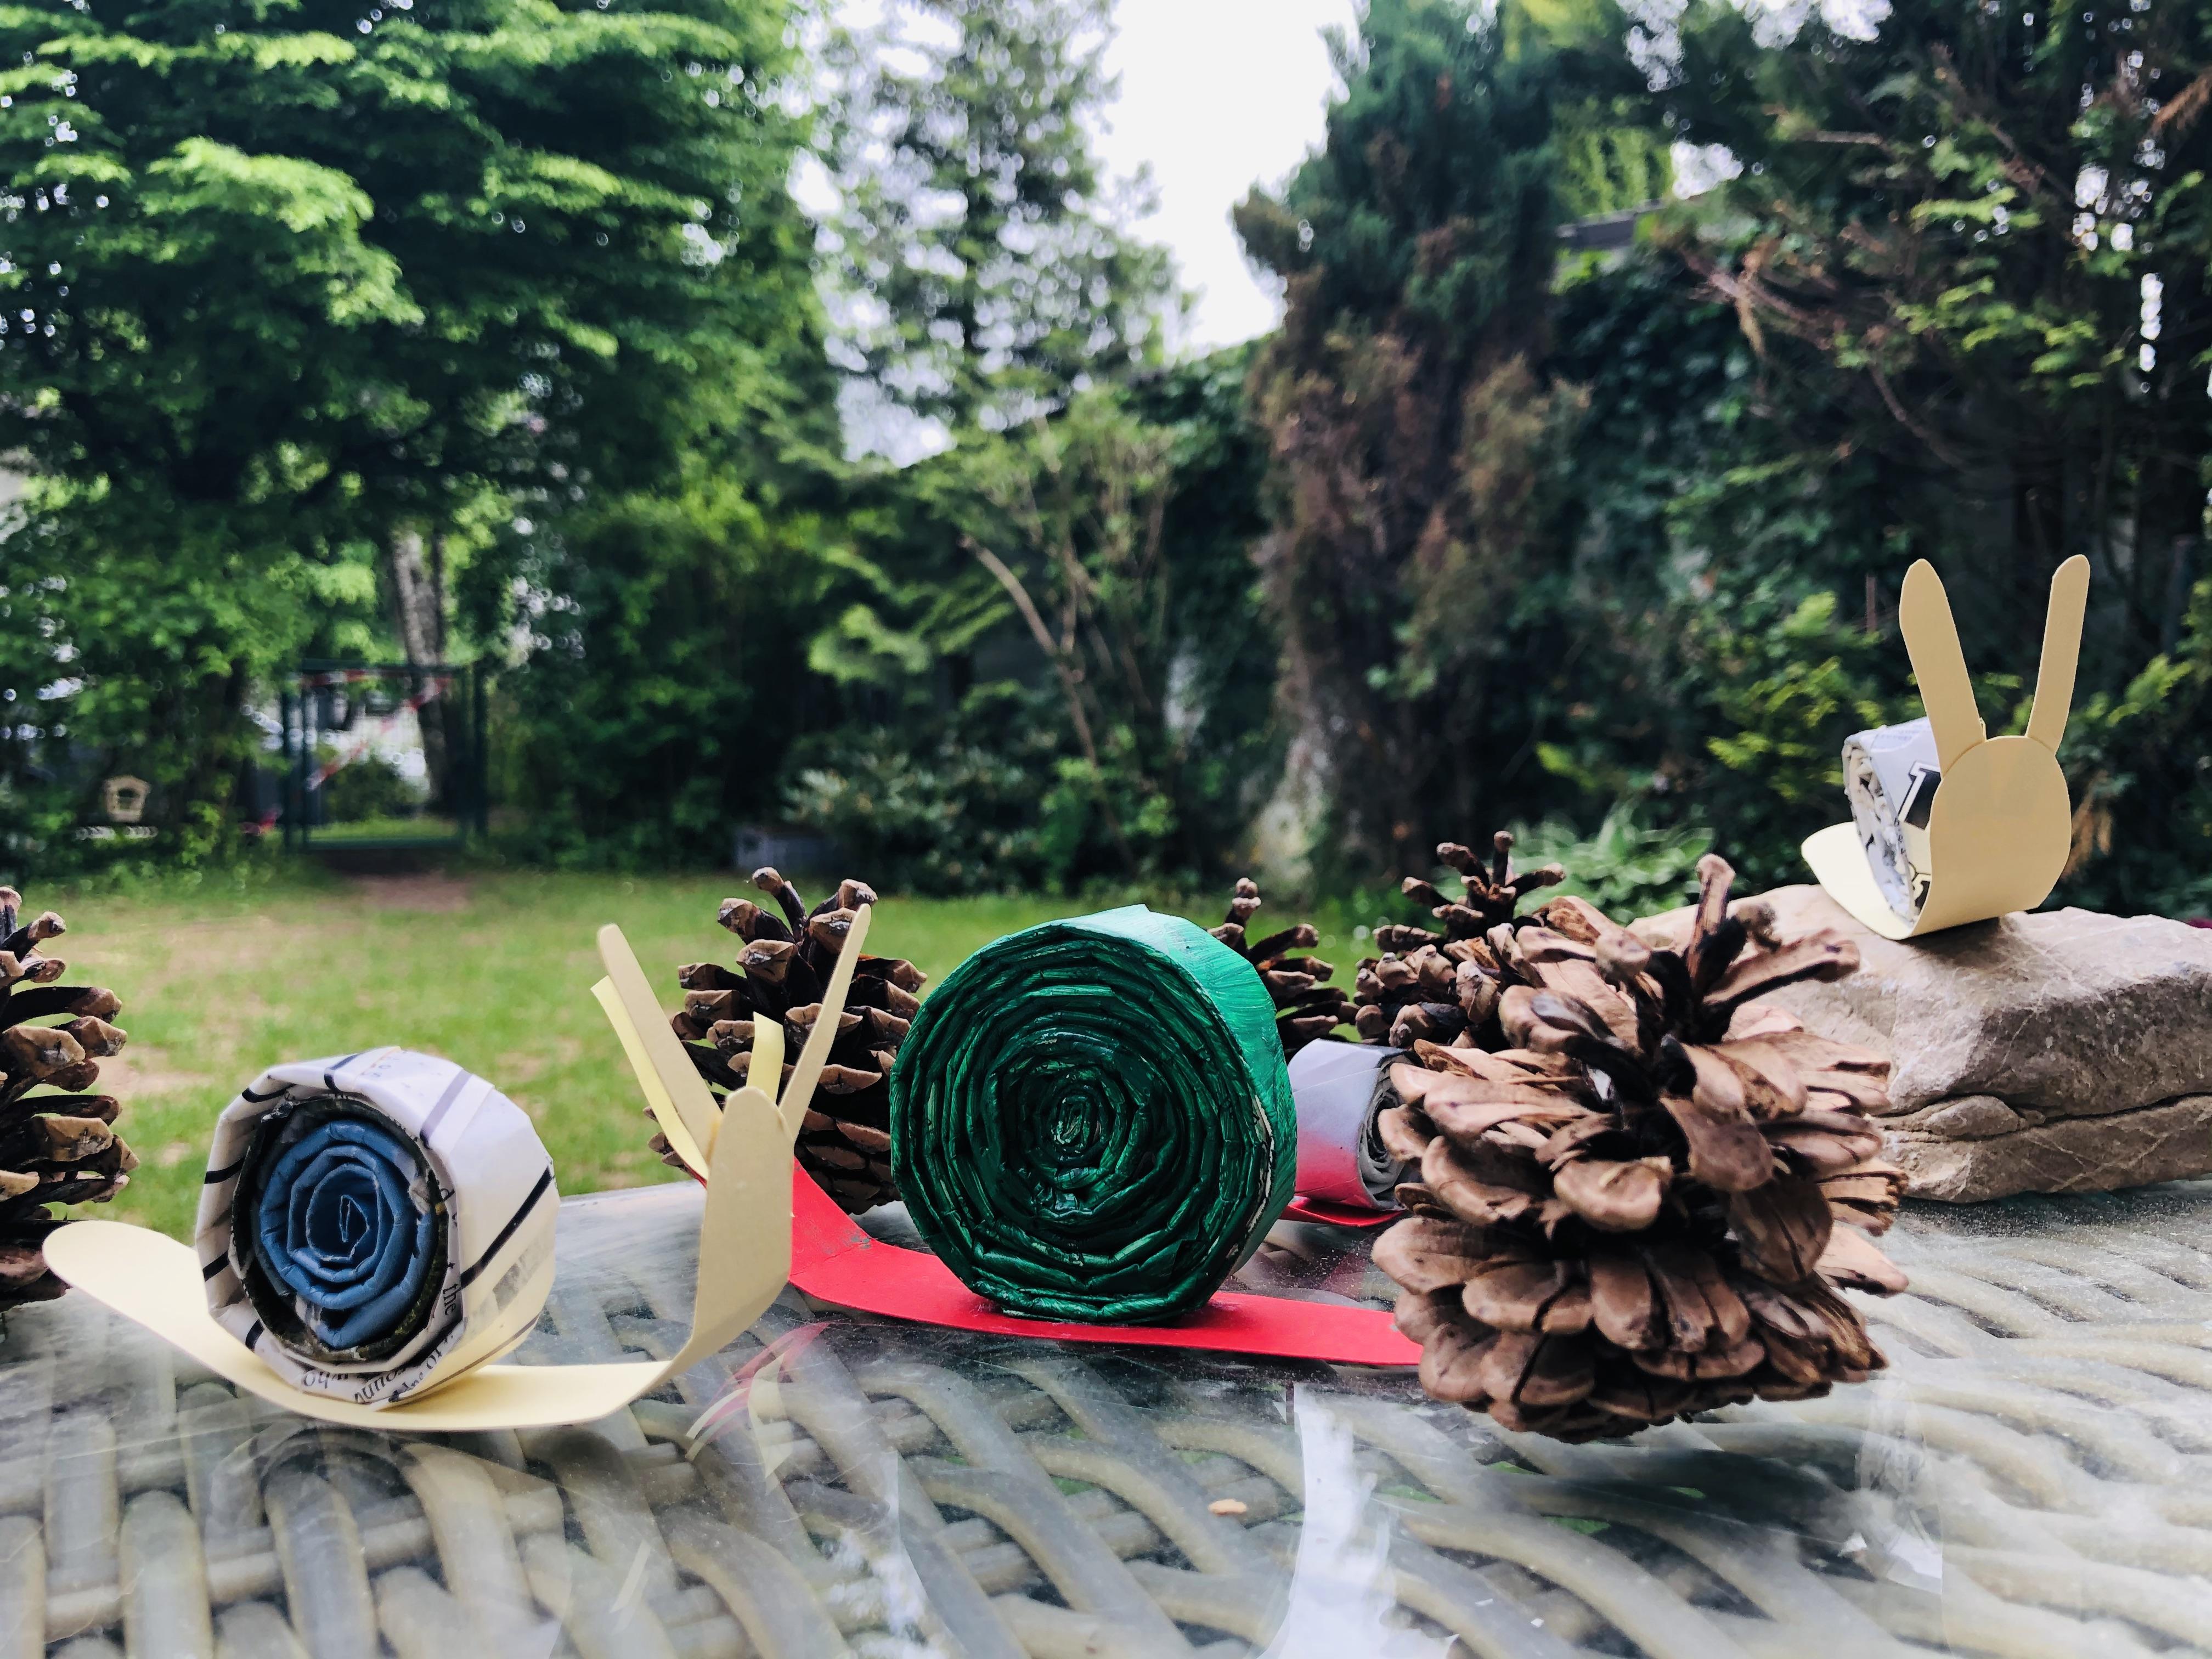 DIY snail toys